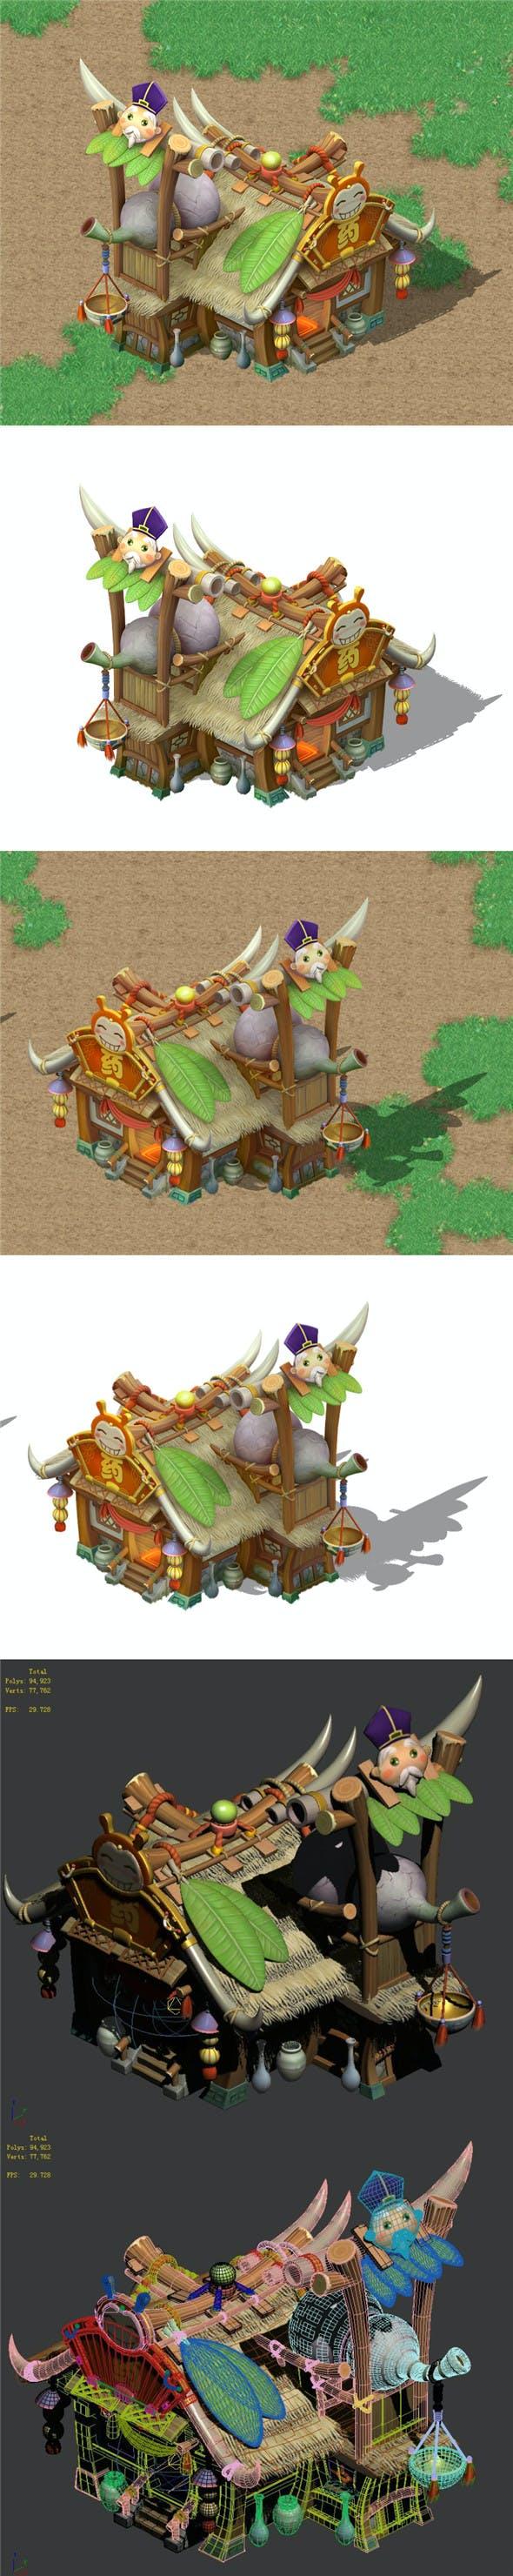 Cartoon World - Drugstore 04 - 3DOcean Item for Sale